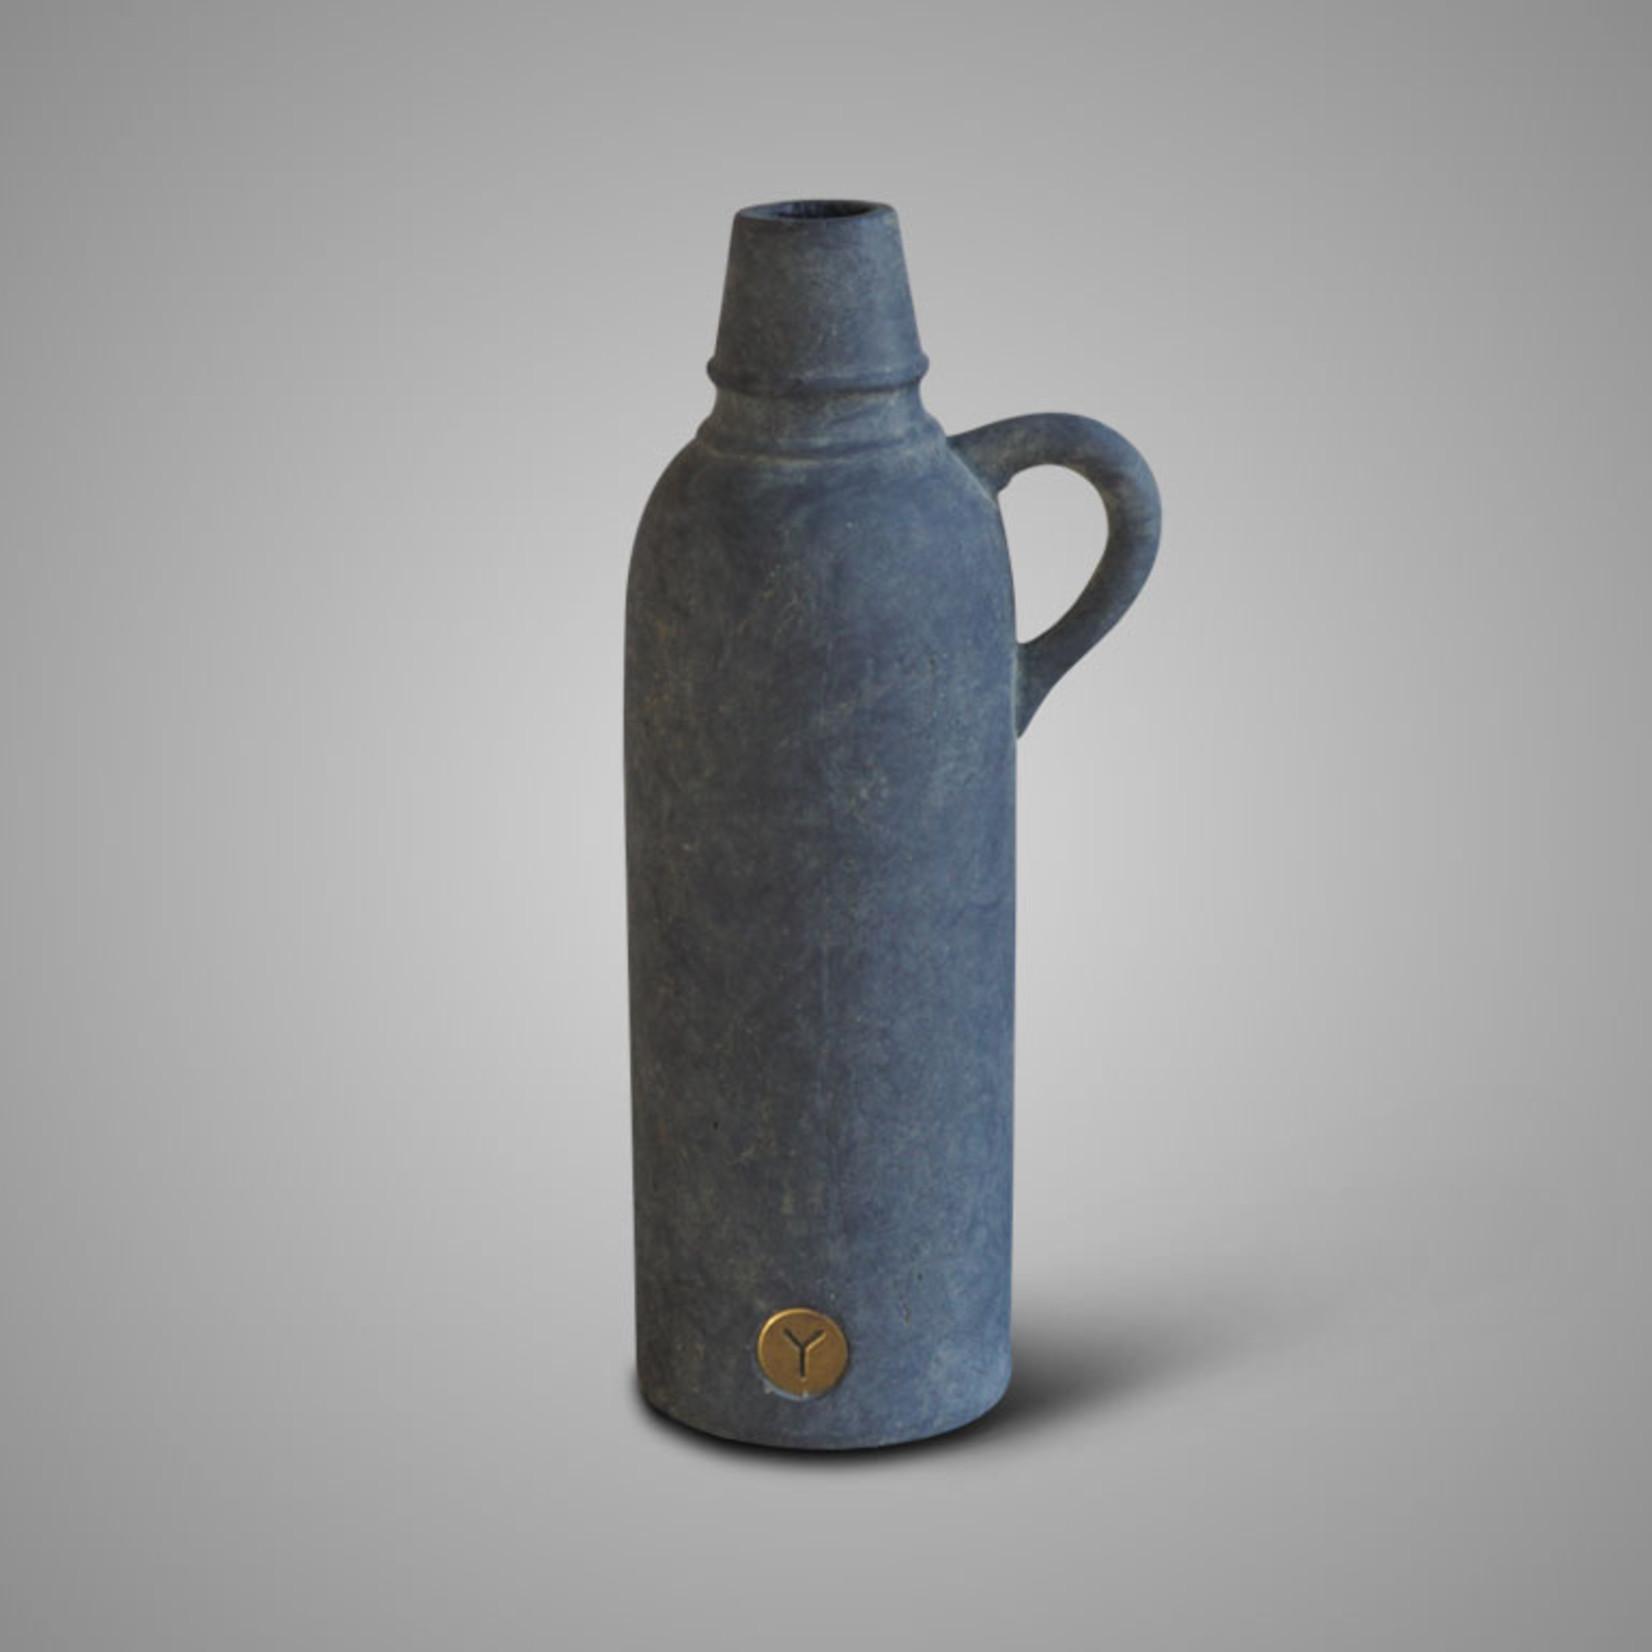 Brynxz Brynxz Bottle With Ear Majestic Vintage L